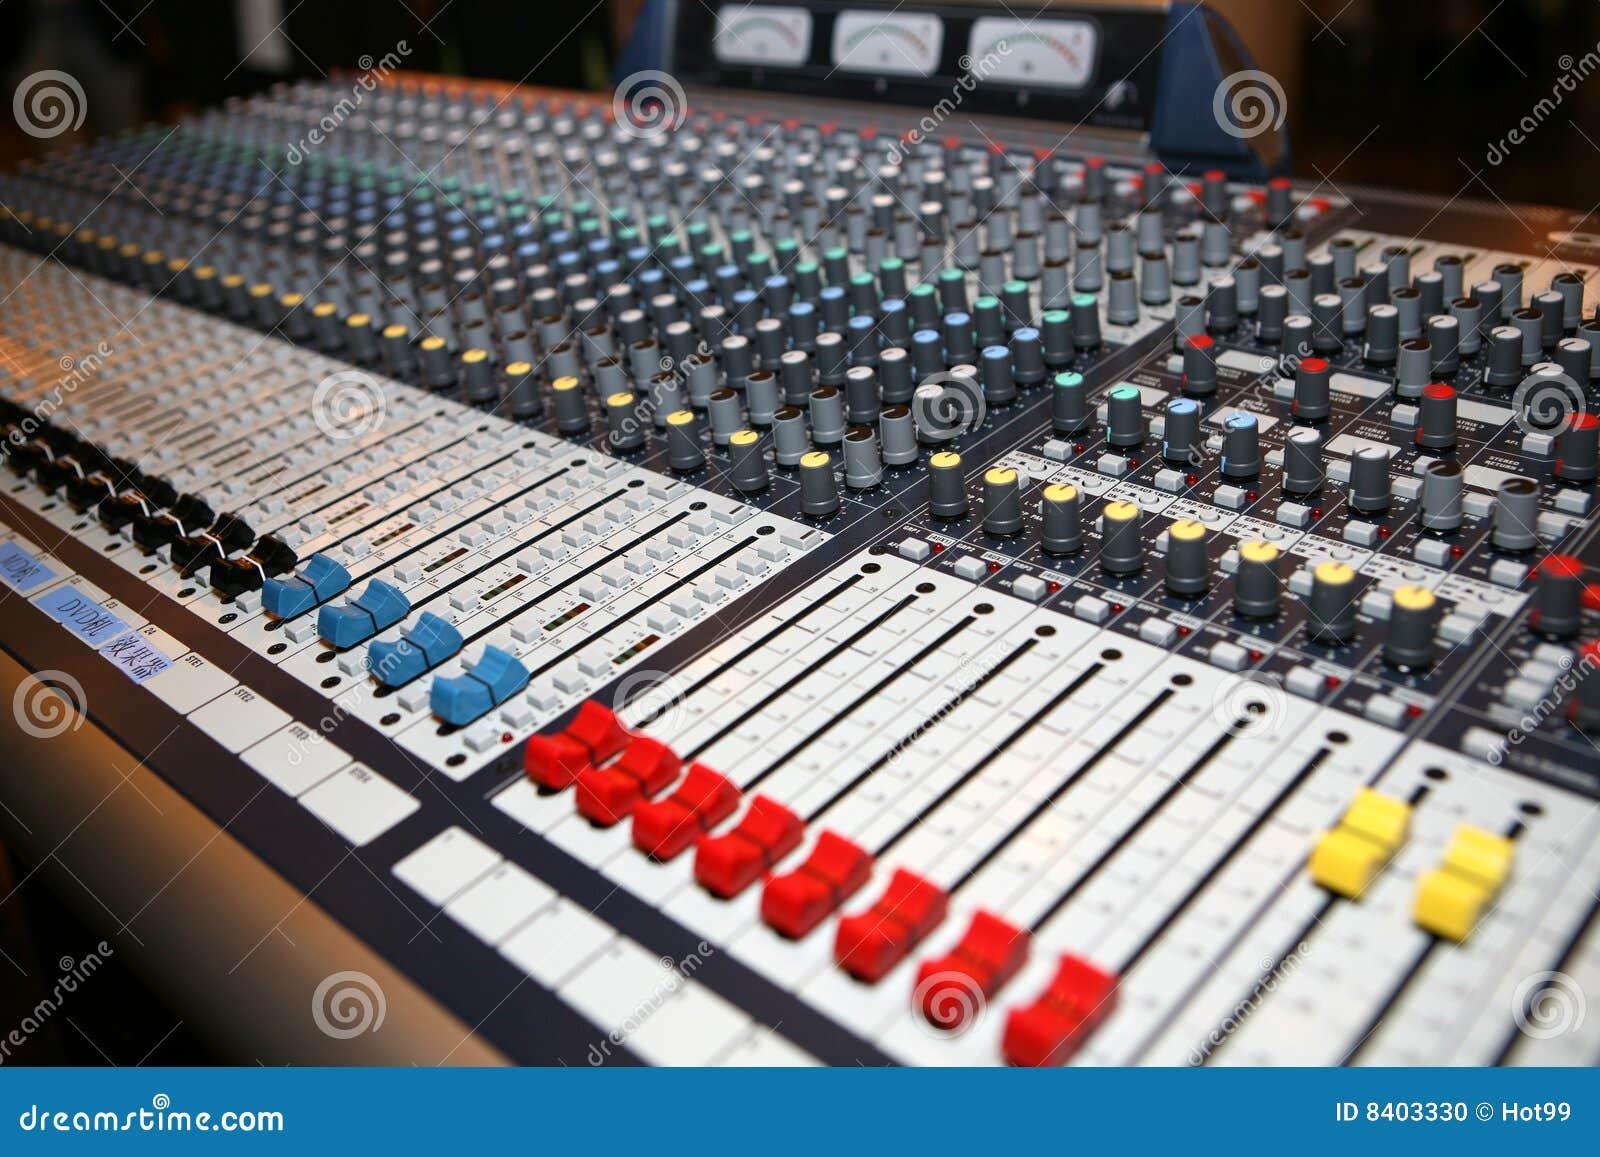 Music Control Panel Stock Photo Image 8403330